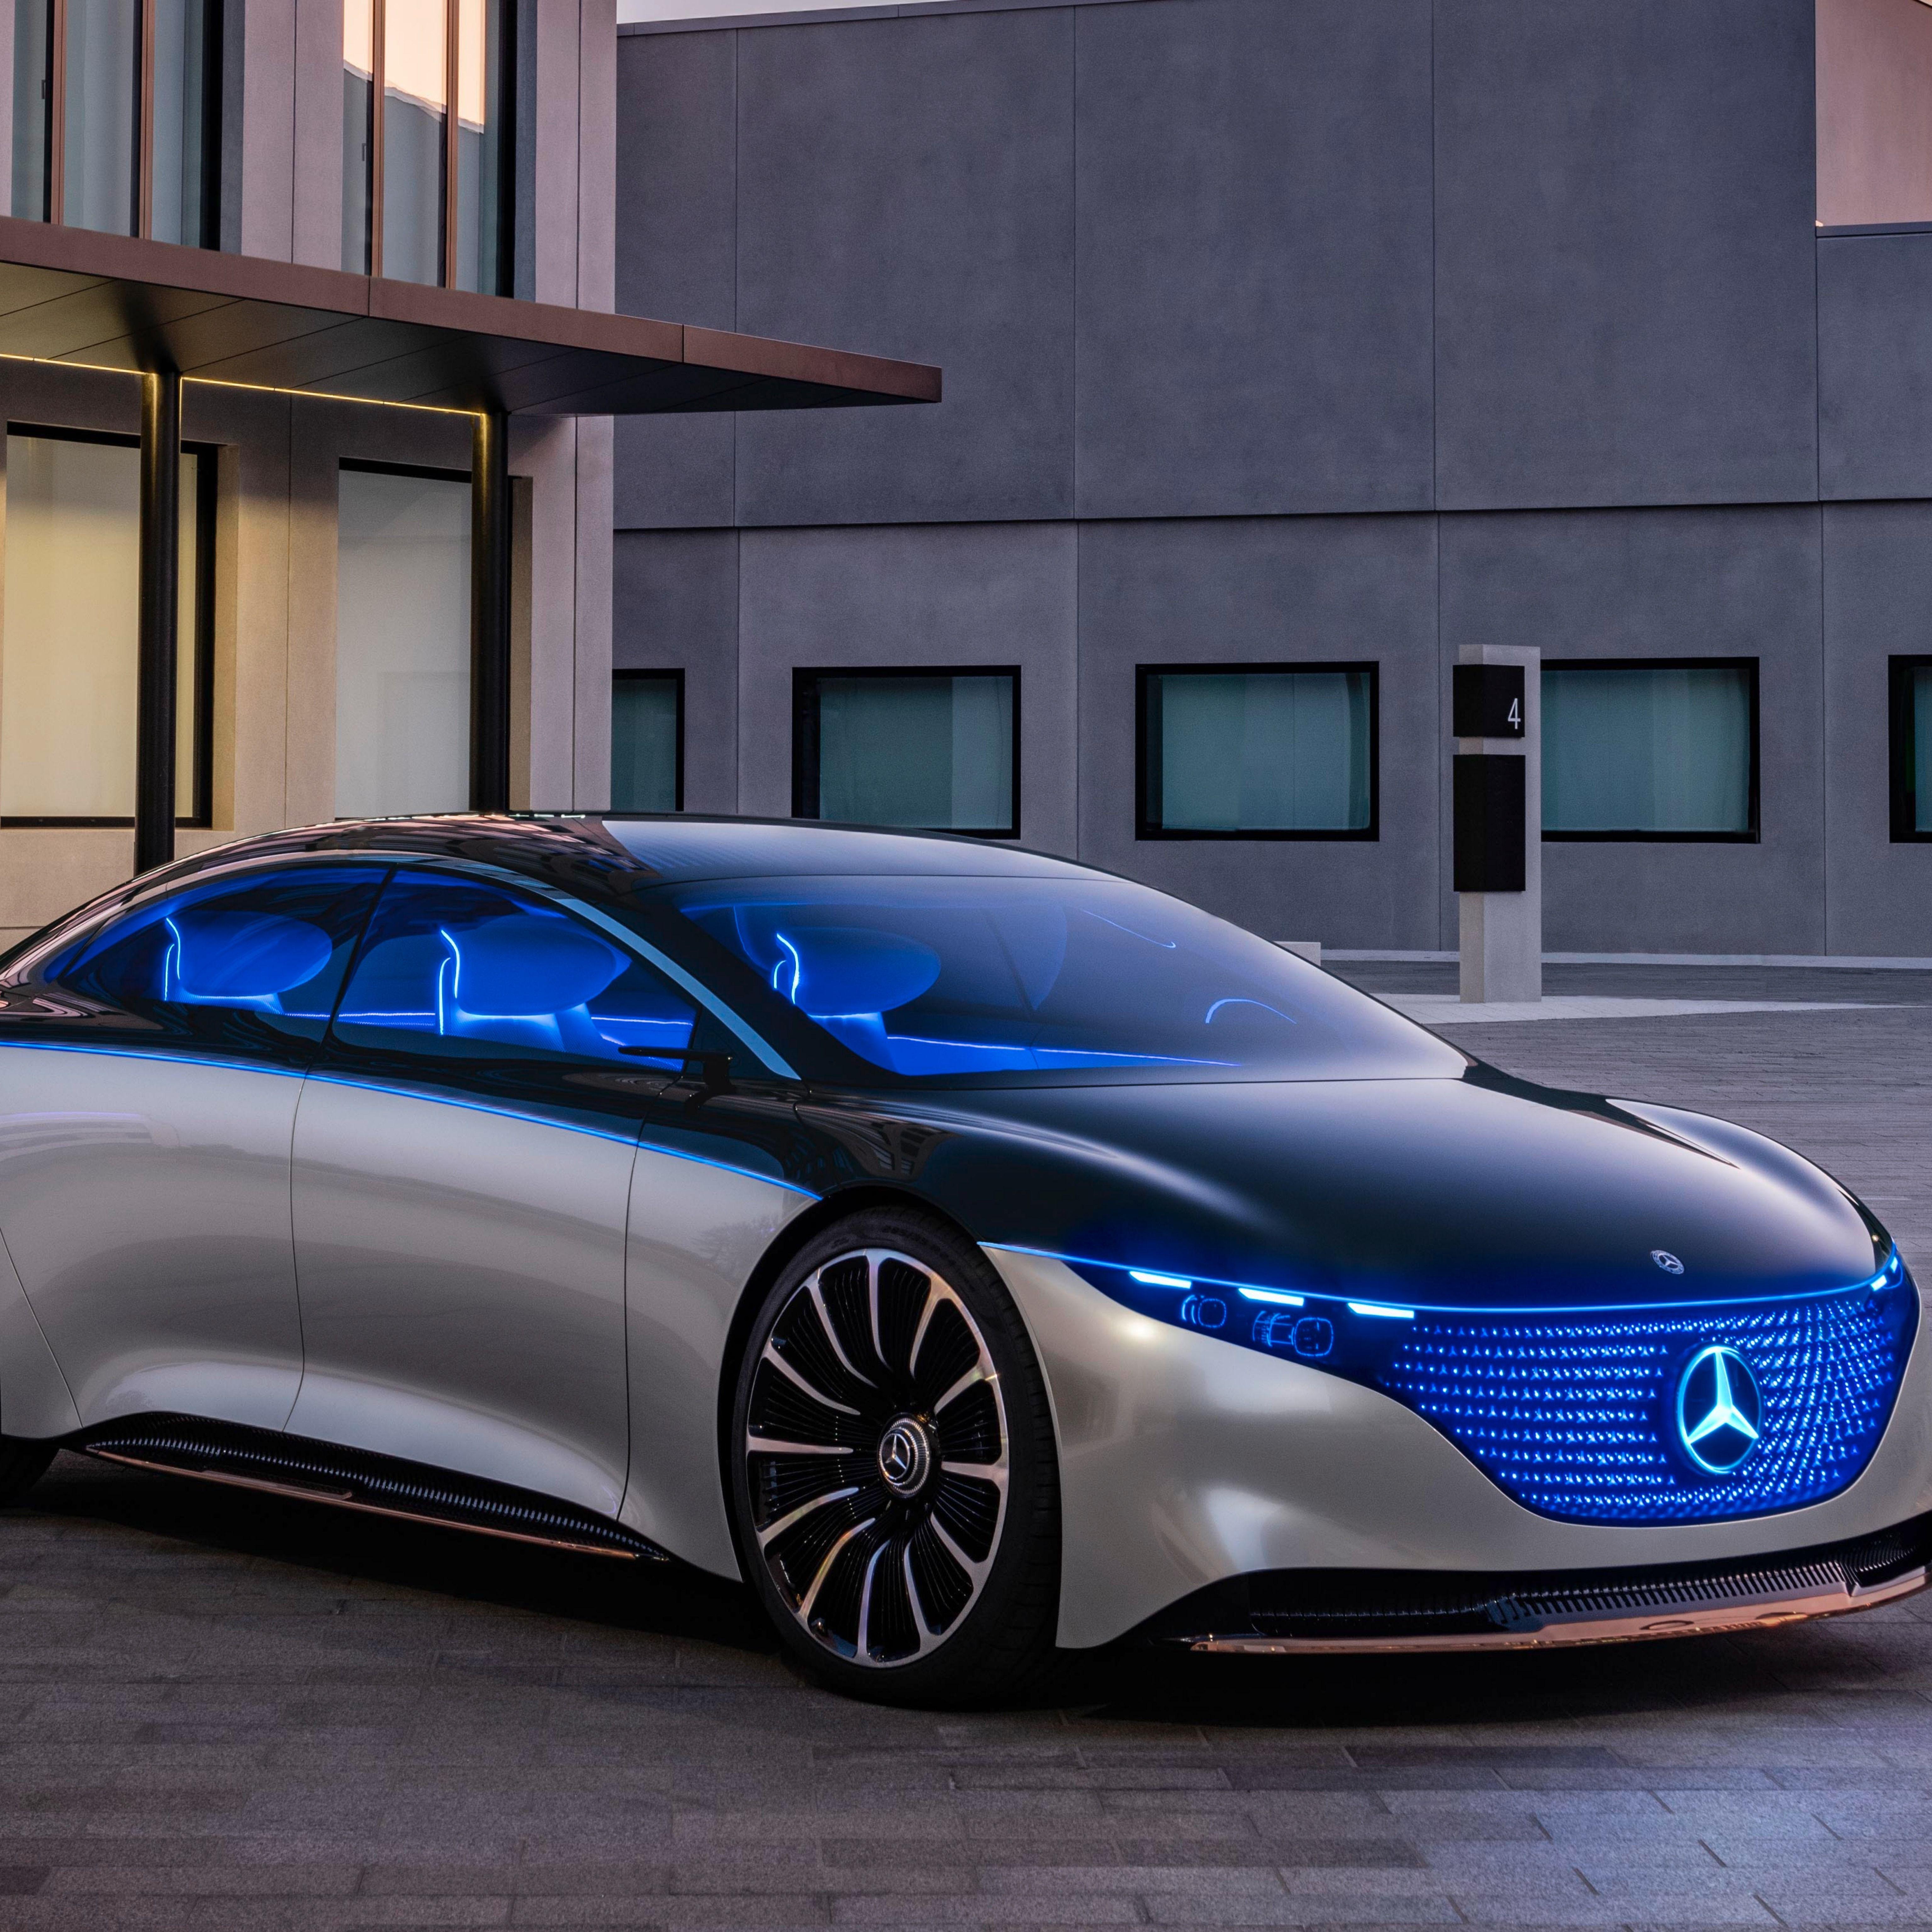 Mercedes-Benz Vision EQS Concept Previews Future Electric